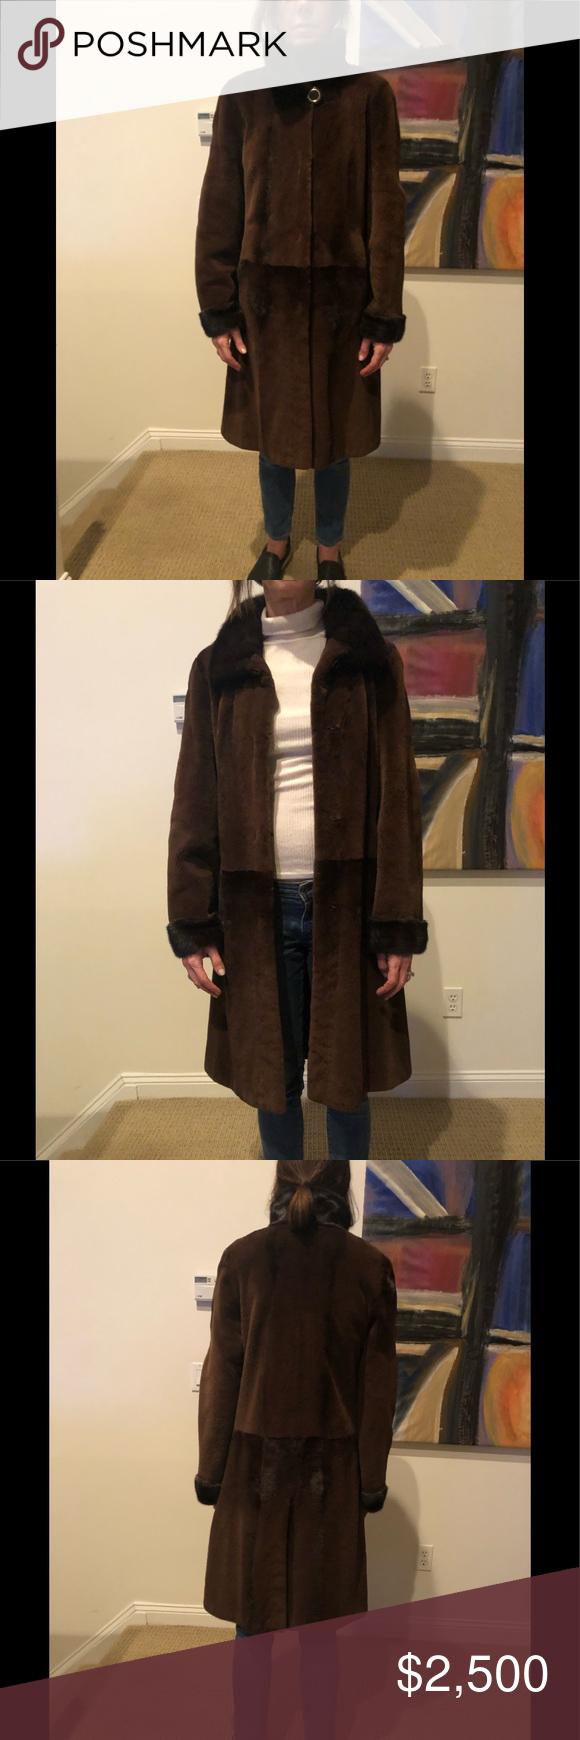 Sheared Mink Coat Mink Coat Coat Jackets For Women [ 1740 x 580 Pixel ]